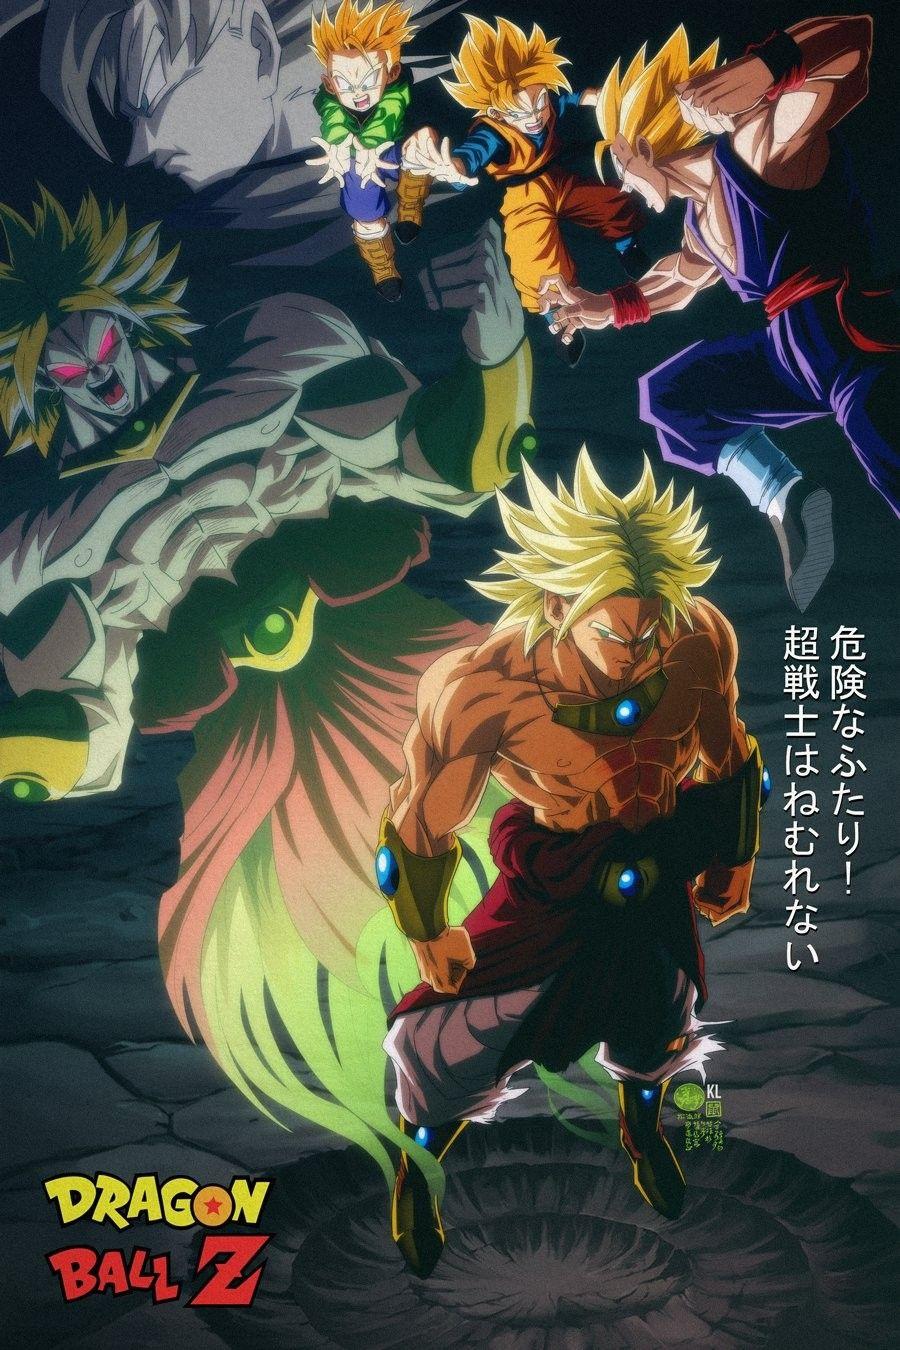 El Regreso Del Guerrero Legendario By Limandao In 2020 Anime Dragon Ball Super Dragon Ball Image Dragon Ball Goku